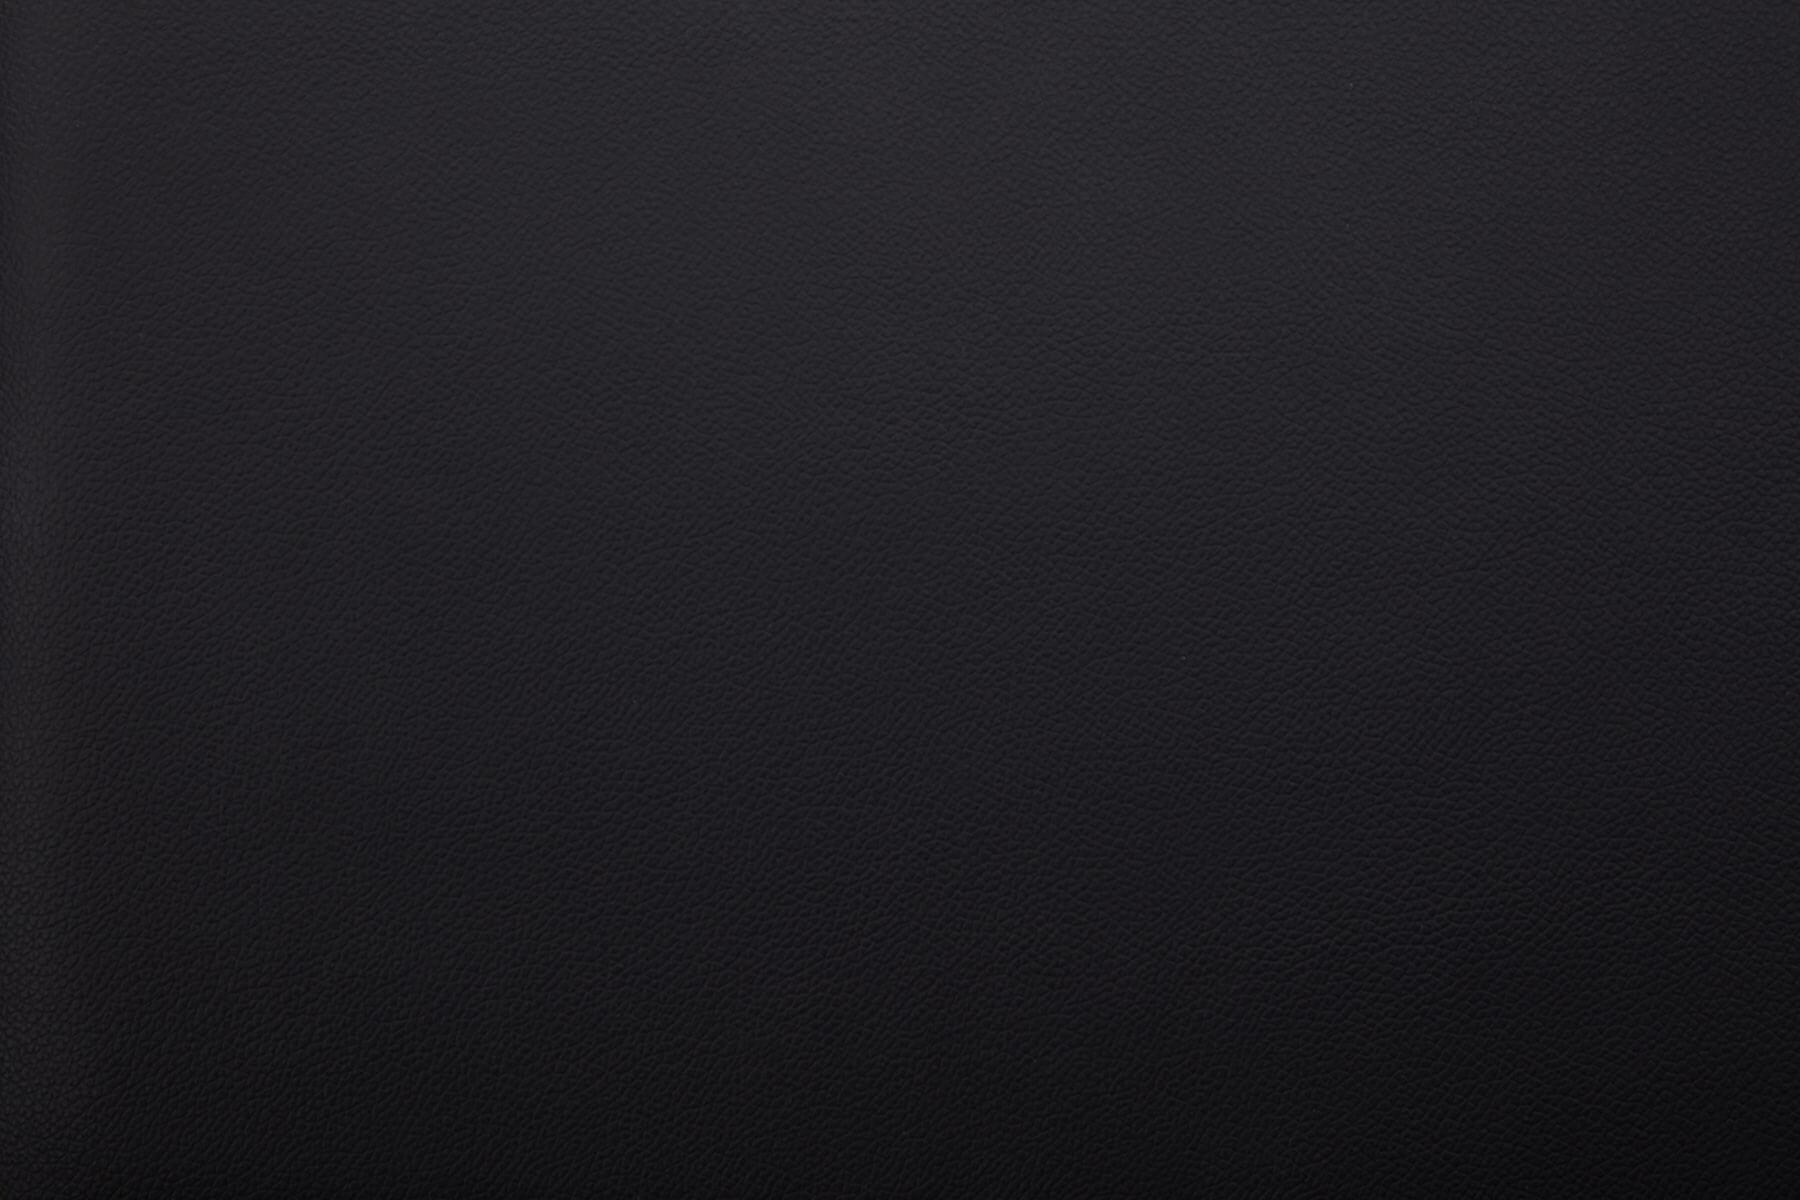 CATALANO-SKU-IST10S900-SKETCH-STOOL-ASH-NAT-PU-BLACK-1367